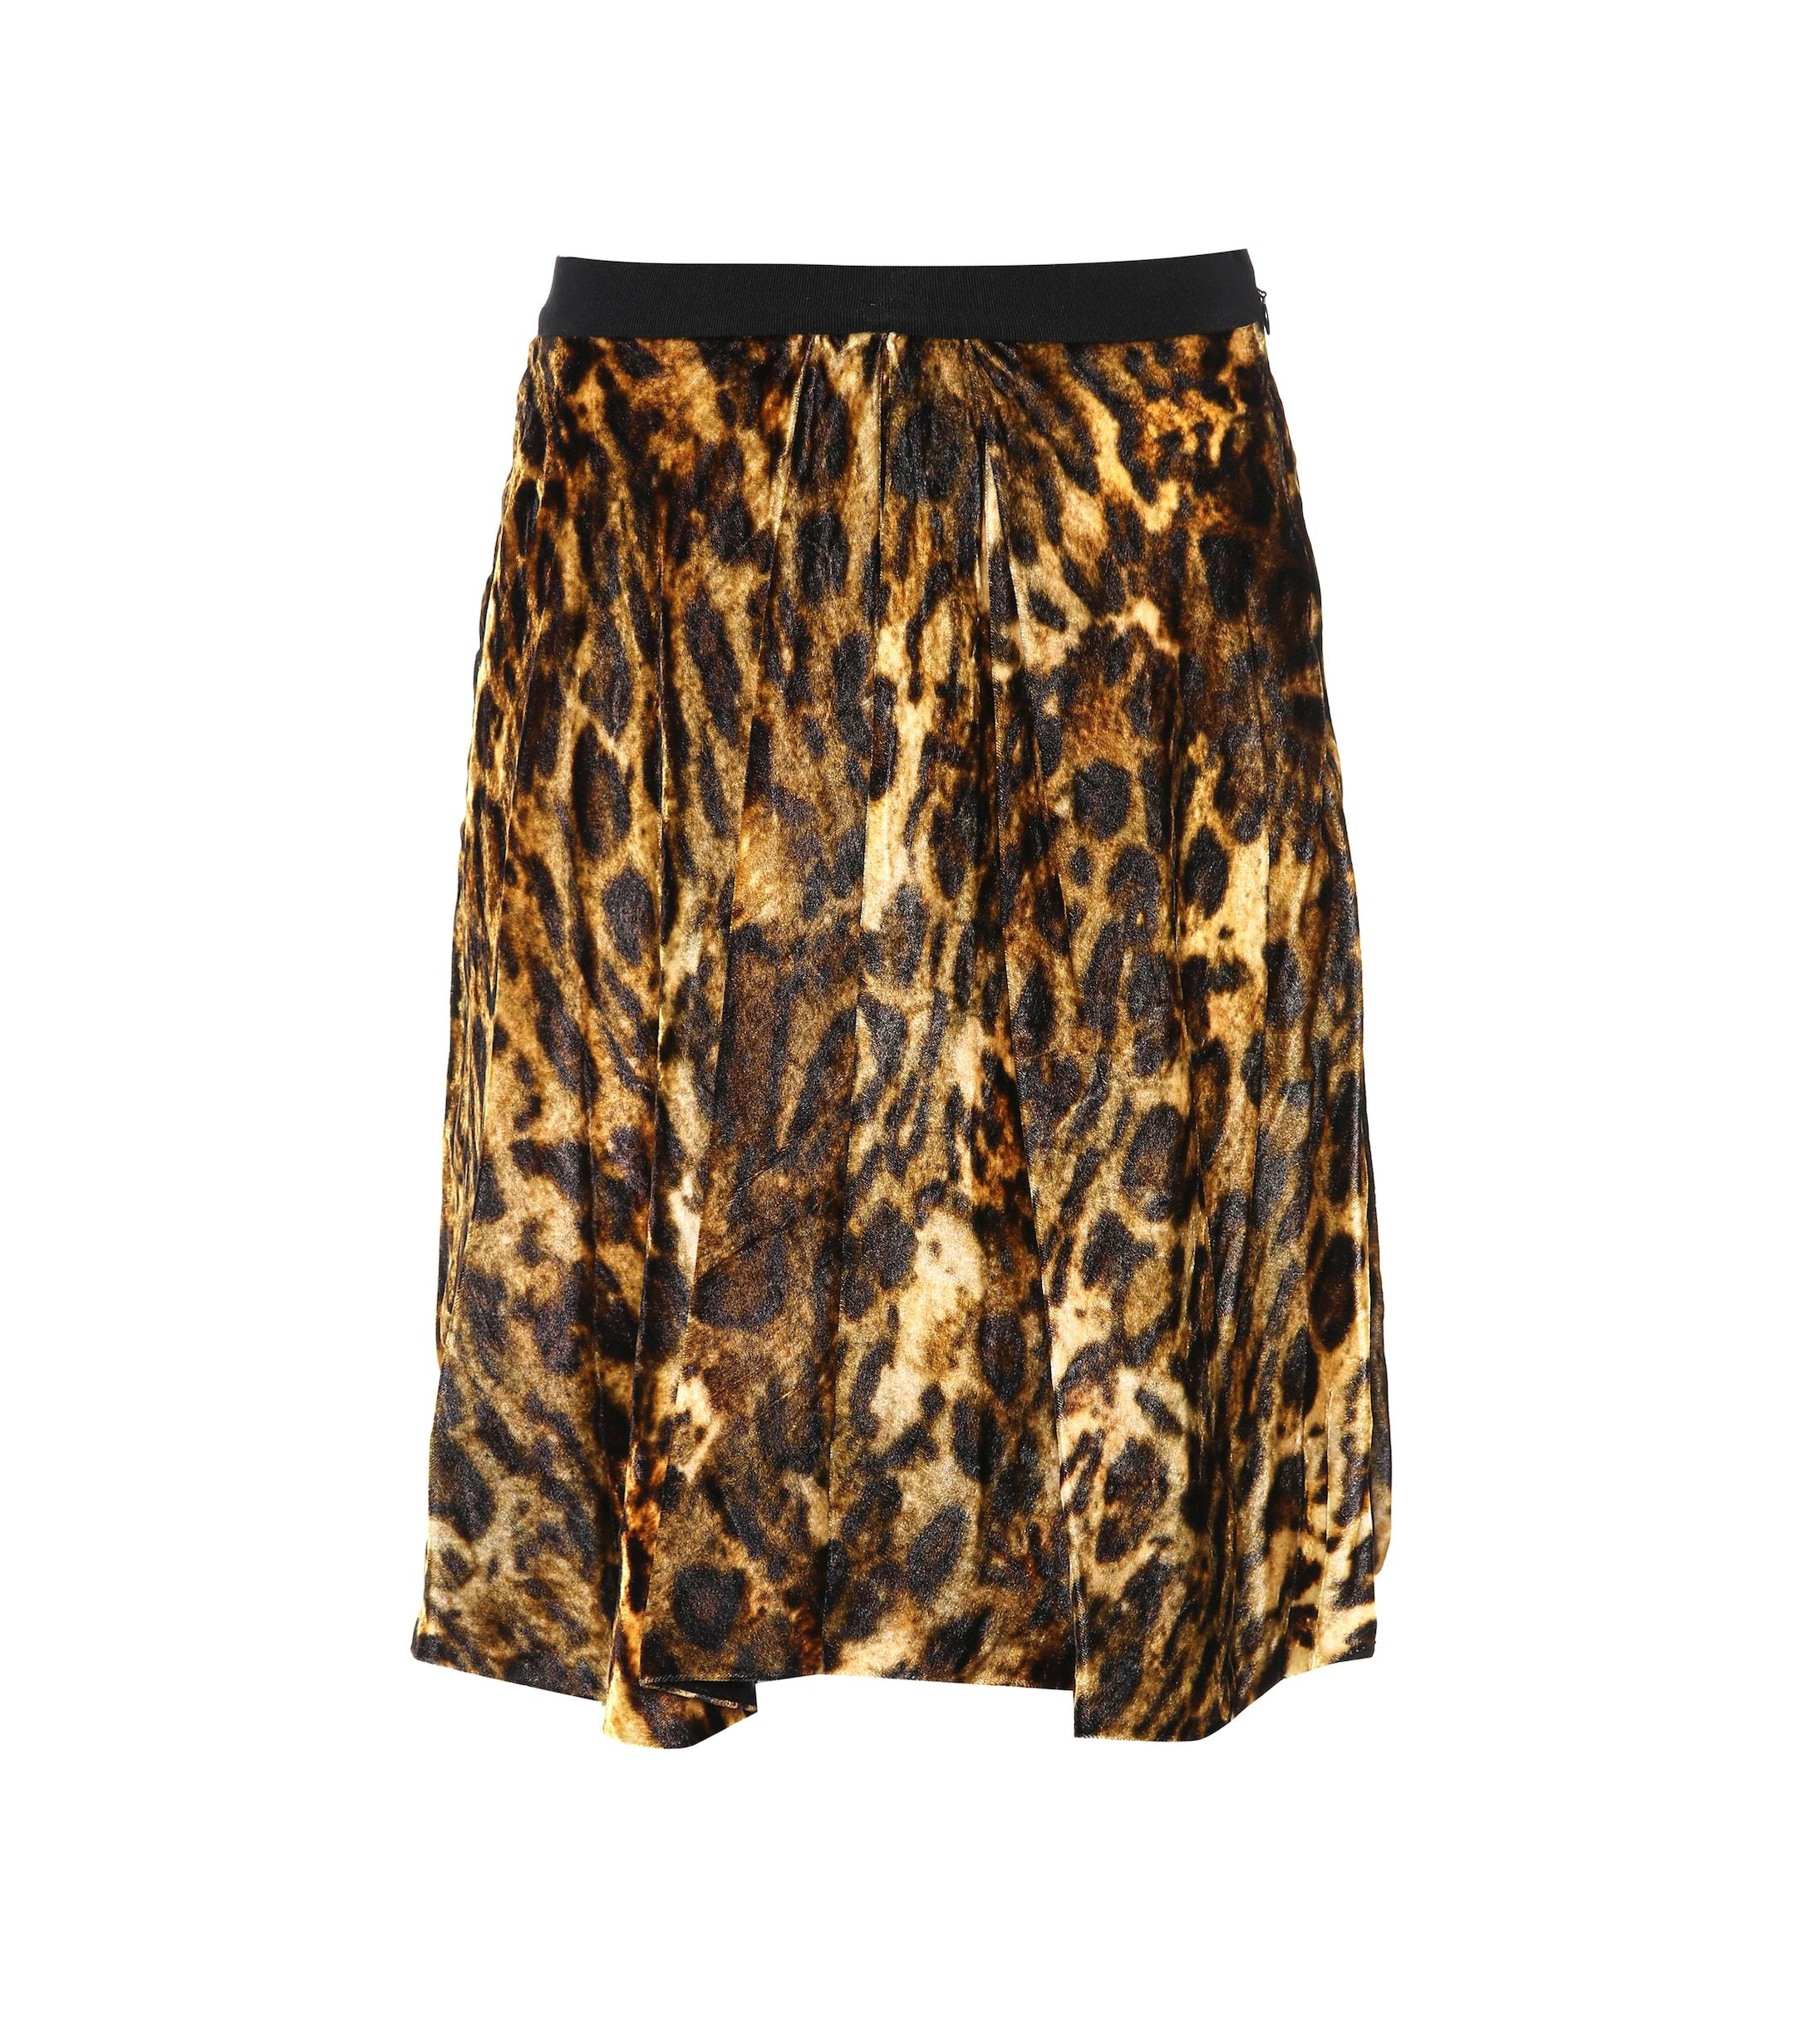 c6c44910aba2 Isabel Marant. Women's Tanza Leopard-printed Skirt